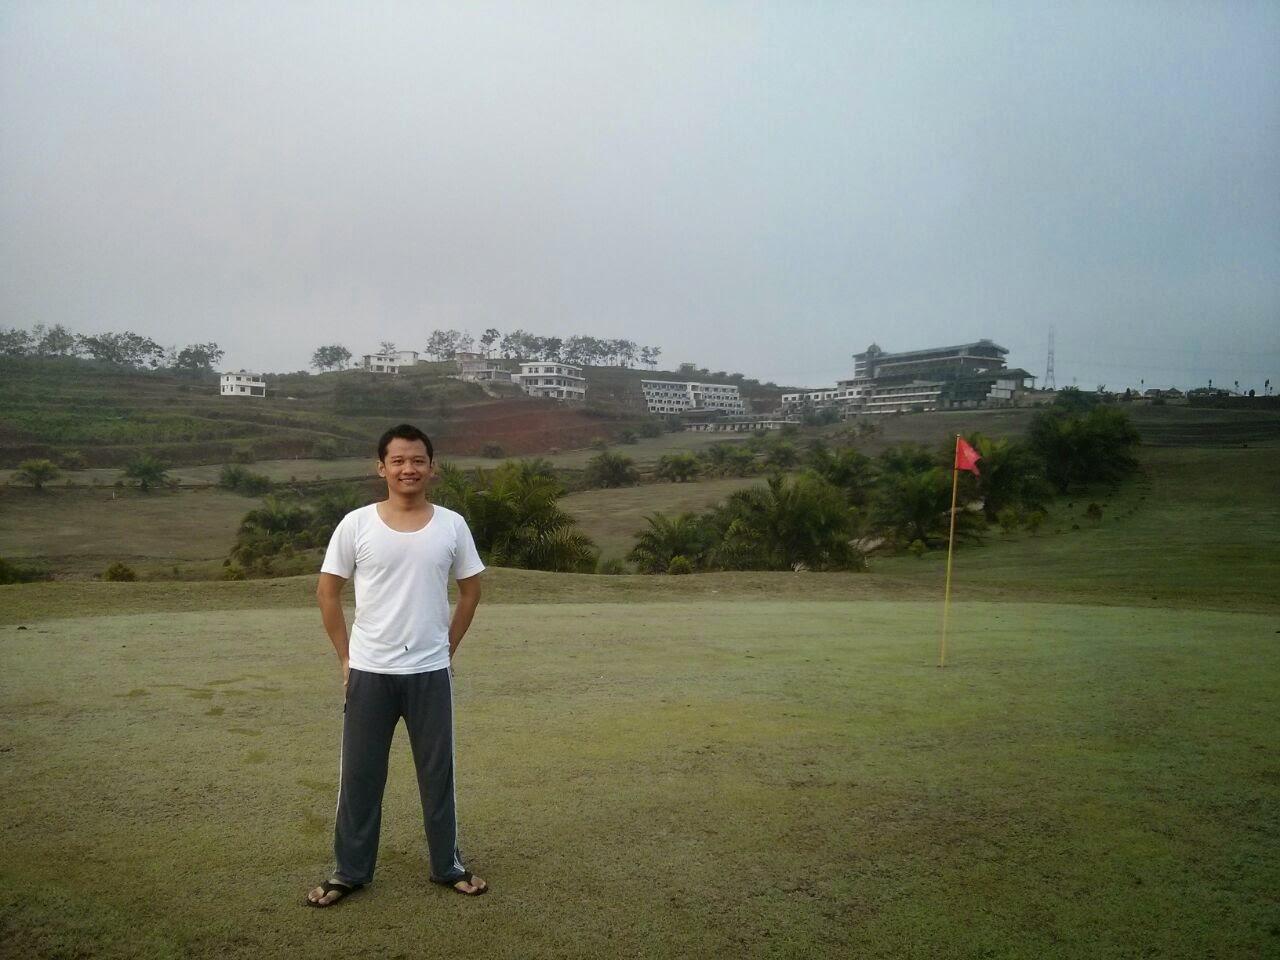 Jalan Pagi Di Lapangan Golf (Hotel Golf Resort Cikidang Sukabumi)